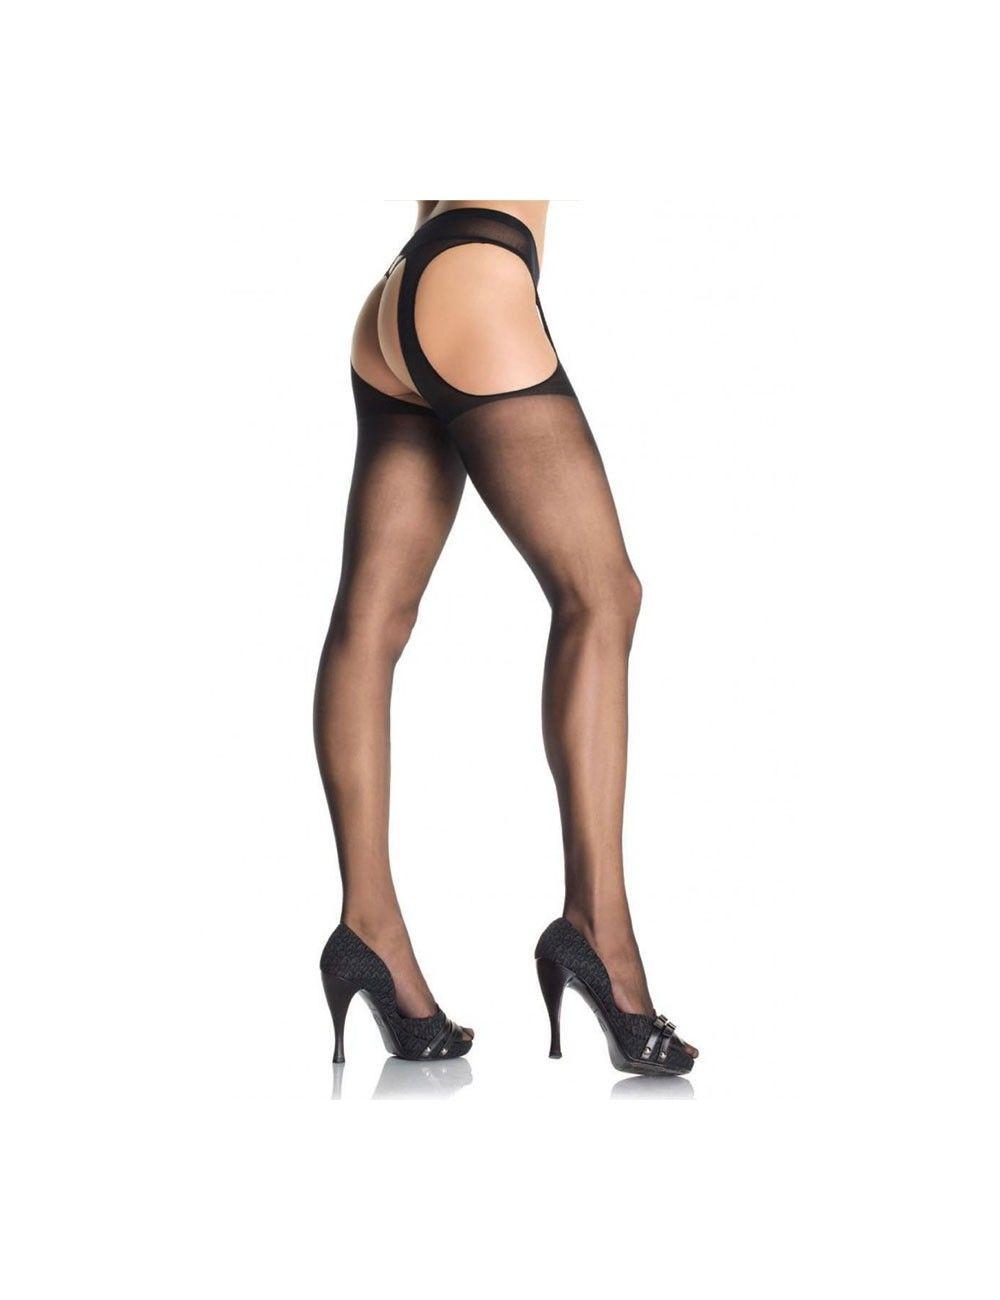 Collant Ouvert Sensuality LEG AVENUE